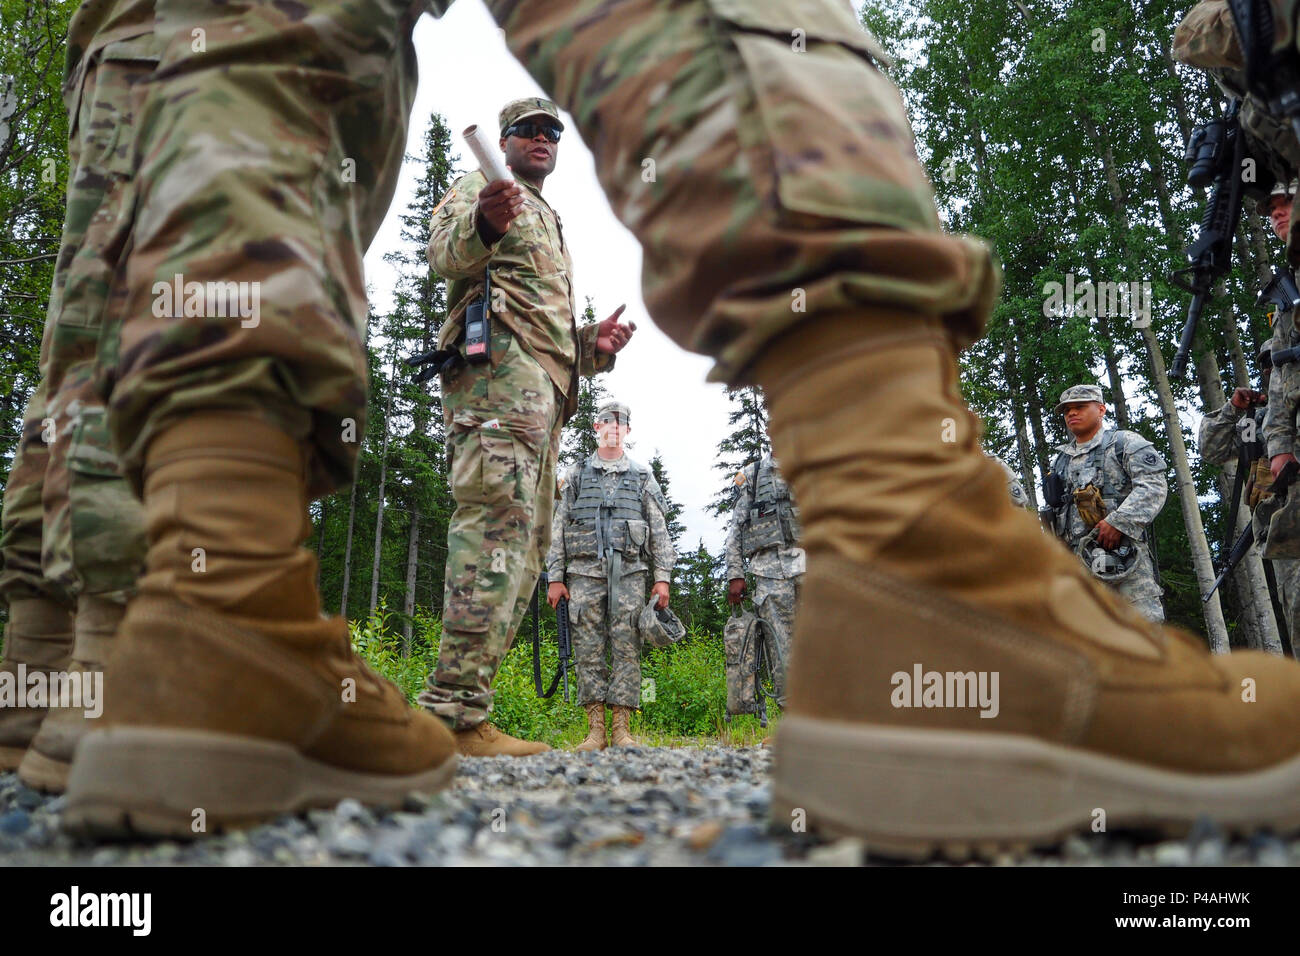 a6c3c941a8131 U S Army 1st Lt Justin Stock Photos   U S Army 1st Lt Justin Stock ...